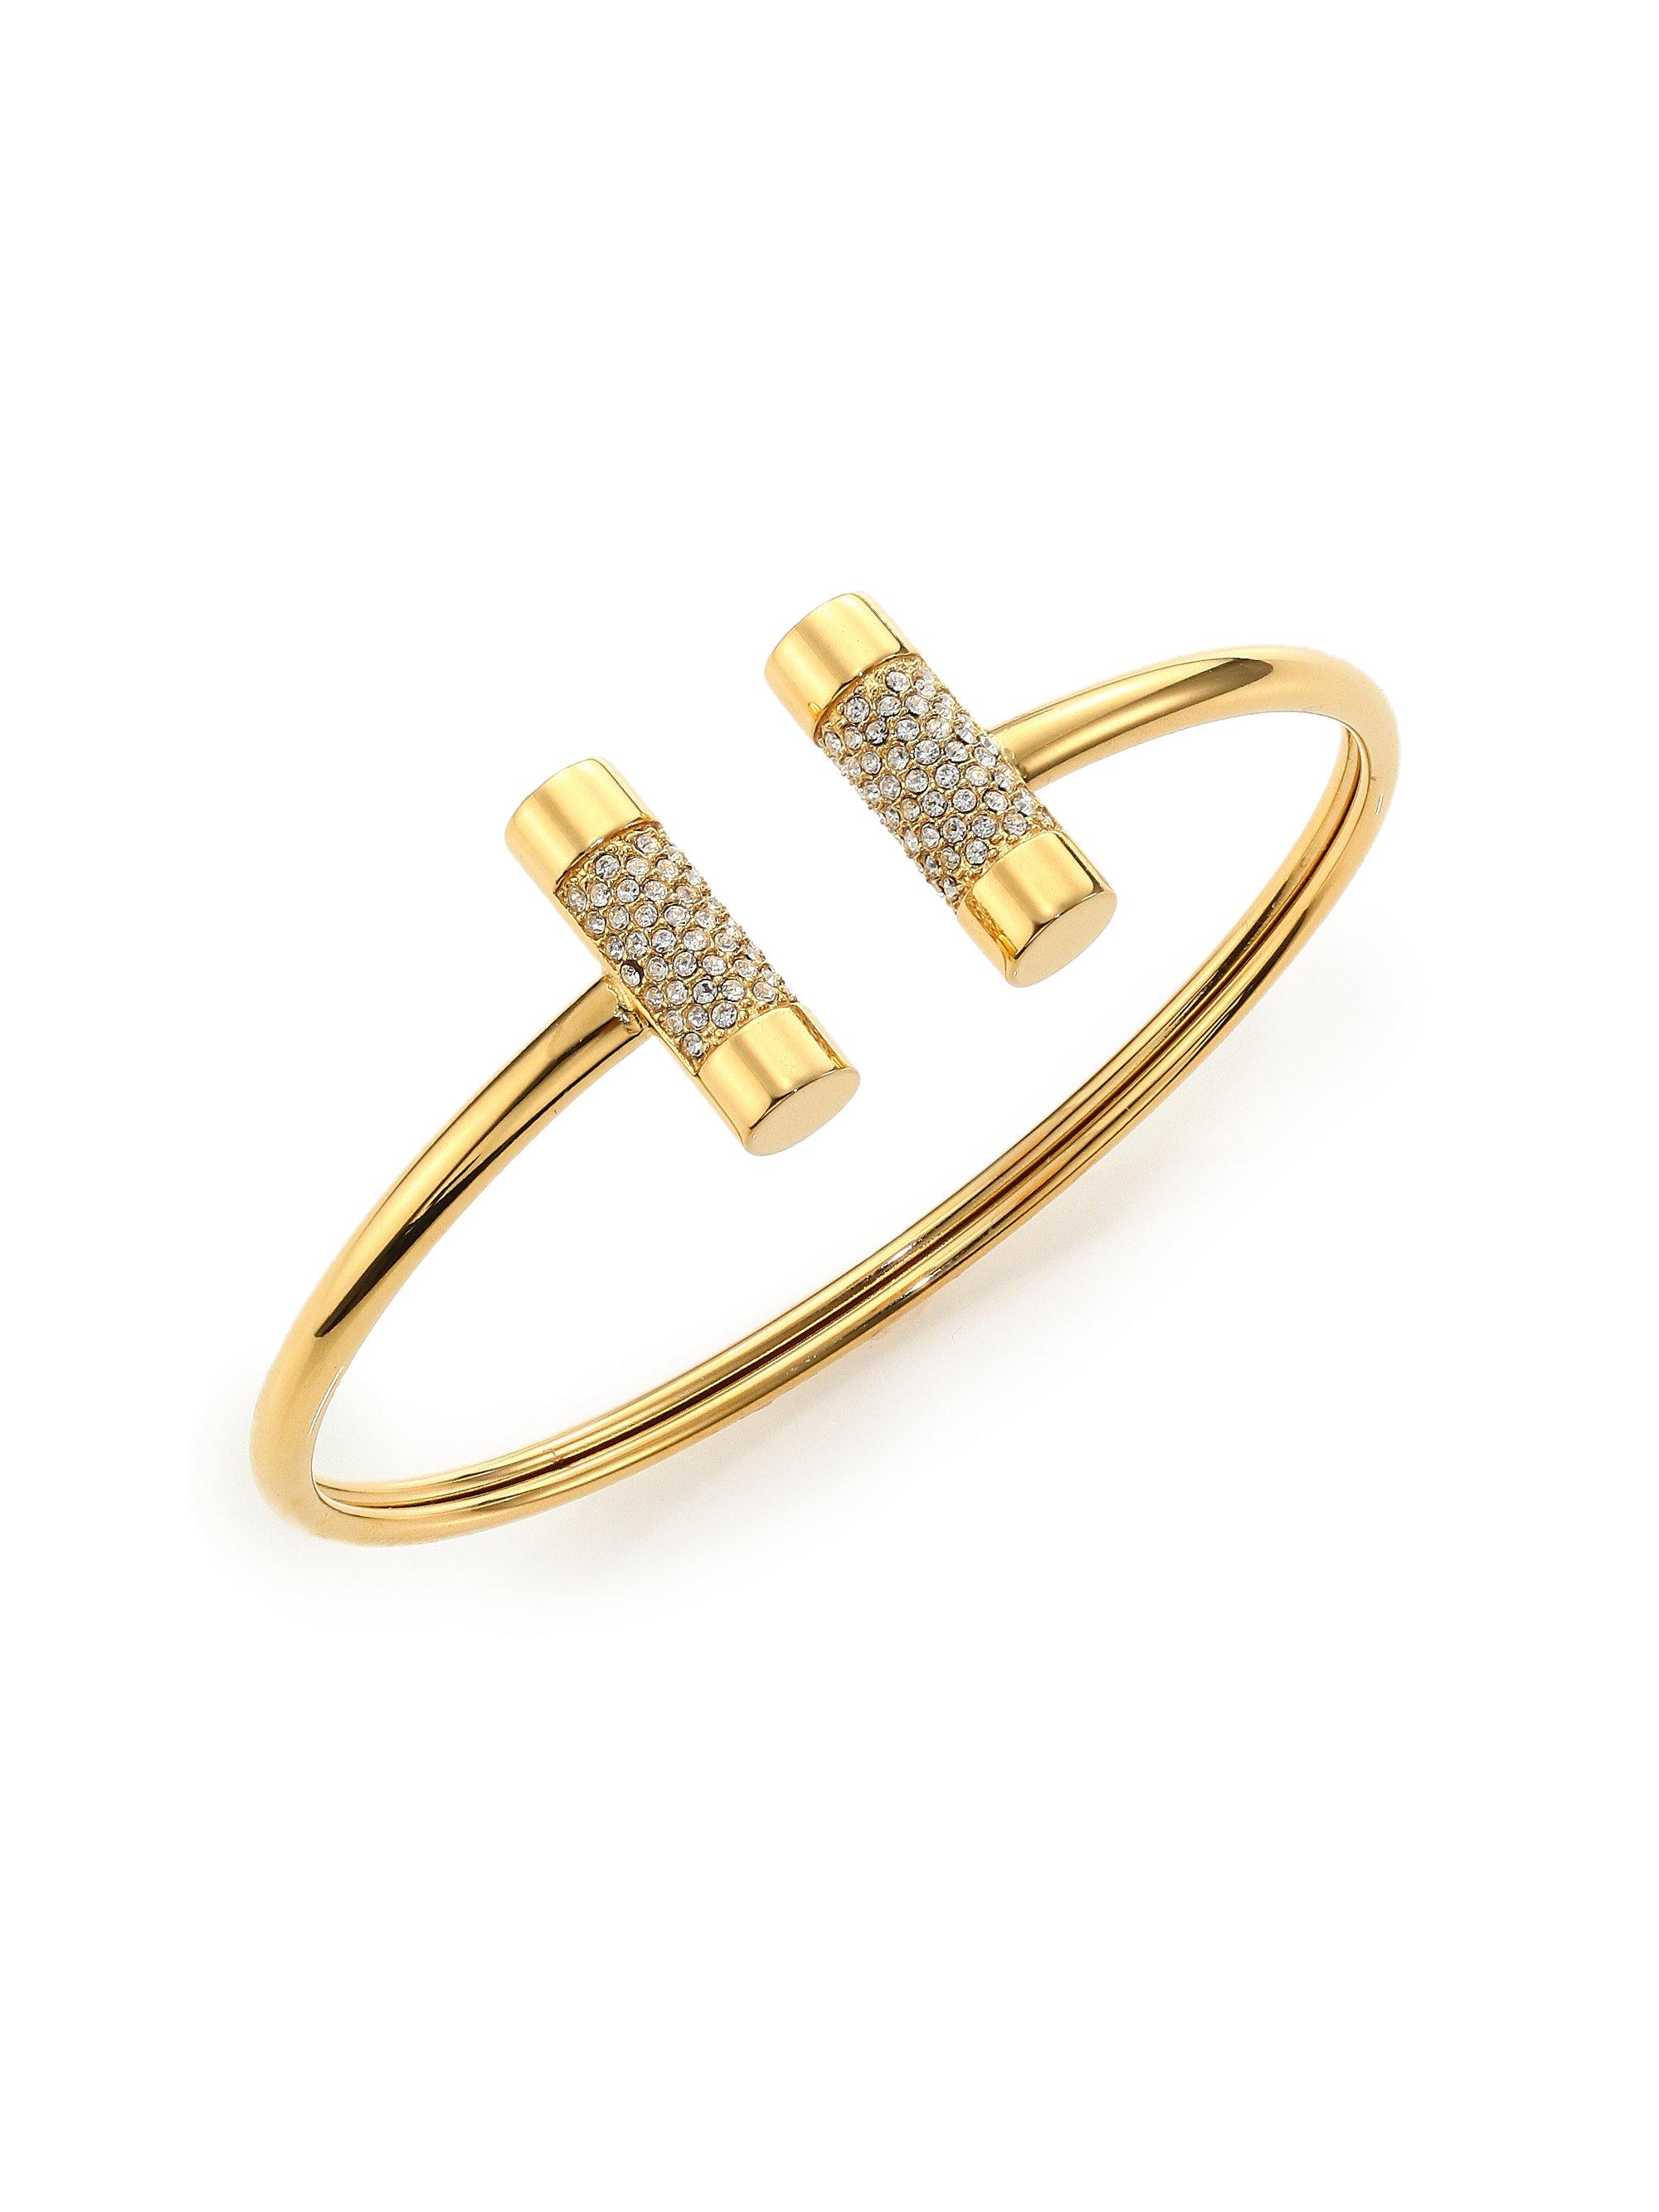 08594f31e2416 Michael Kors Metallic City Barrel Pavé Cuff Bracelet